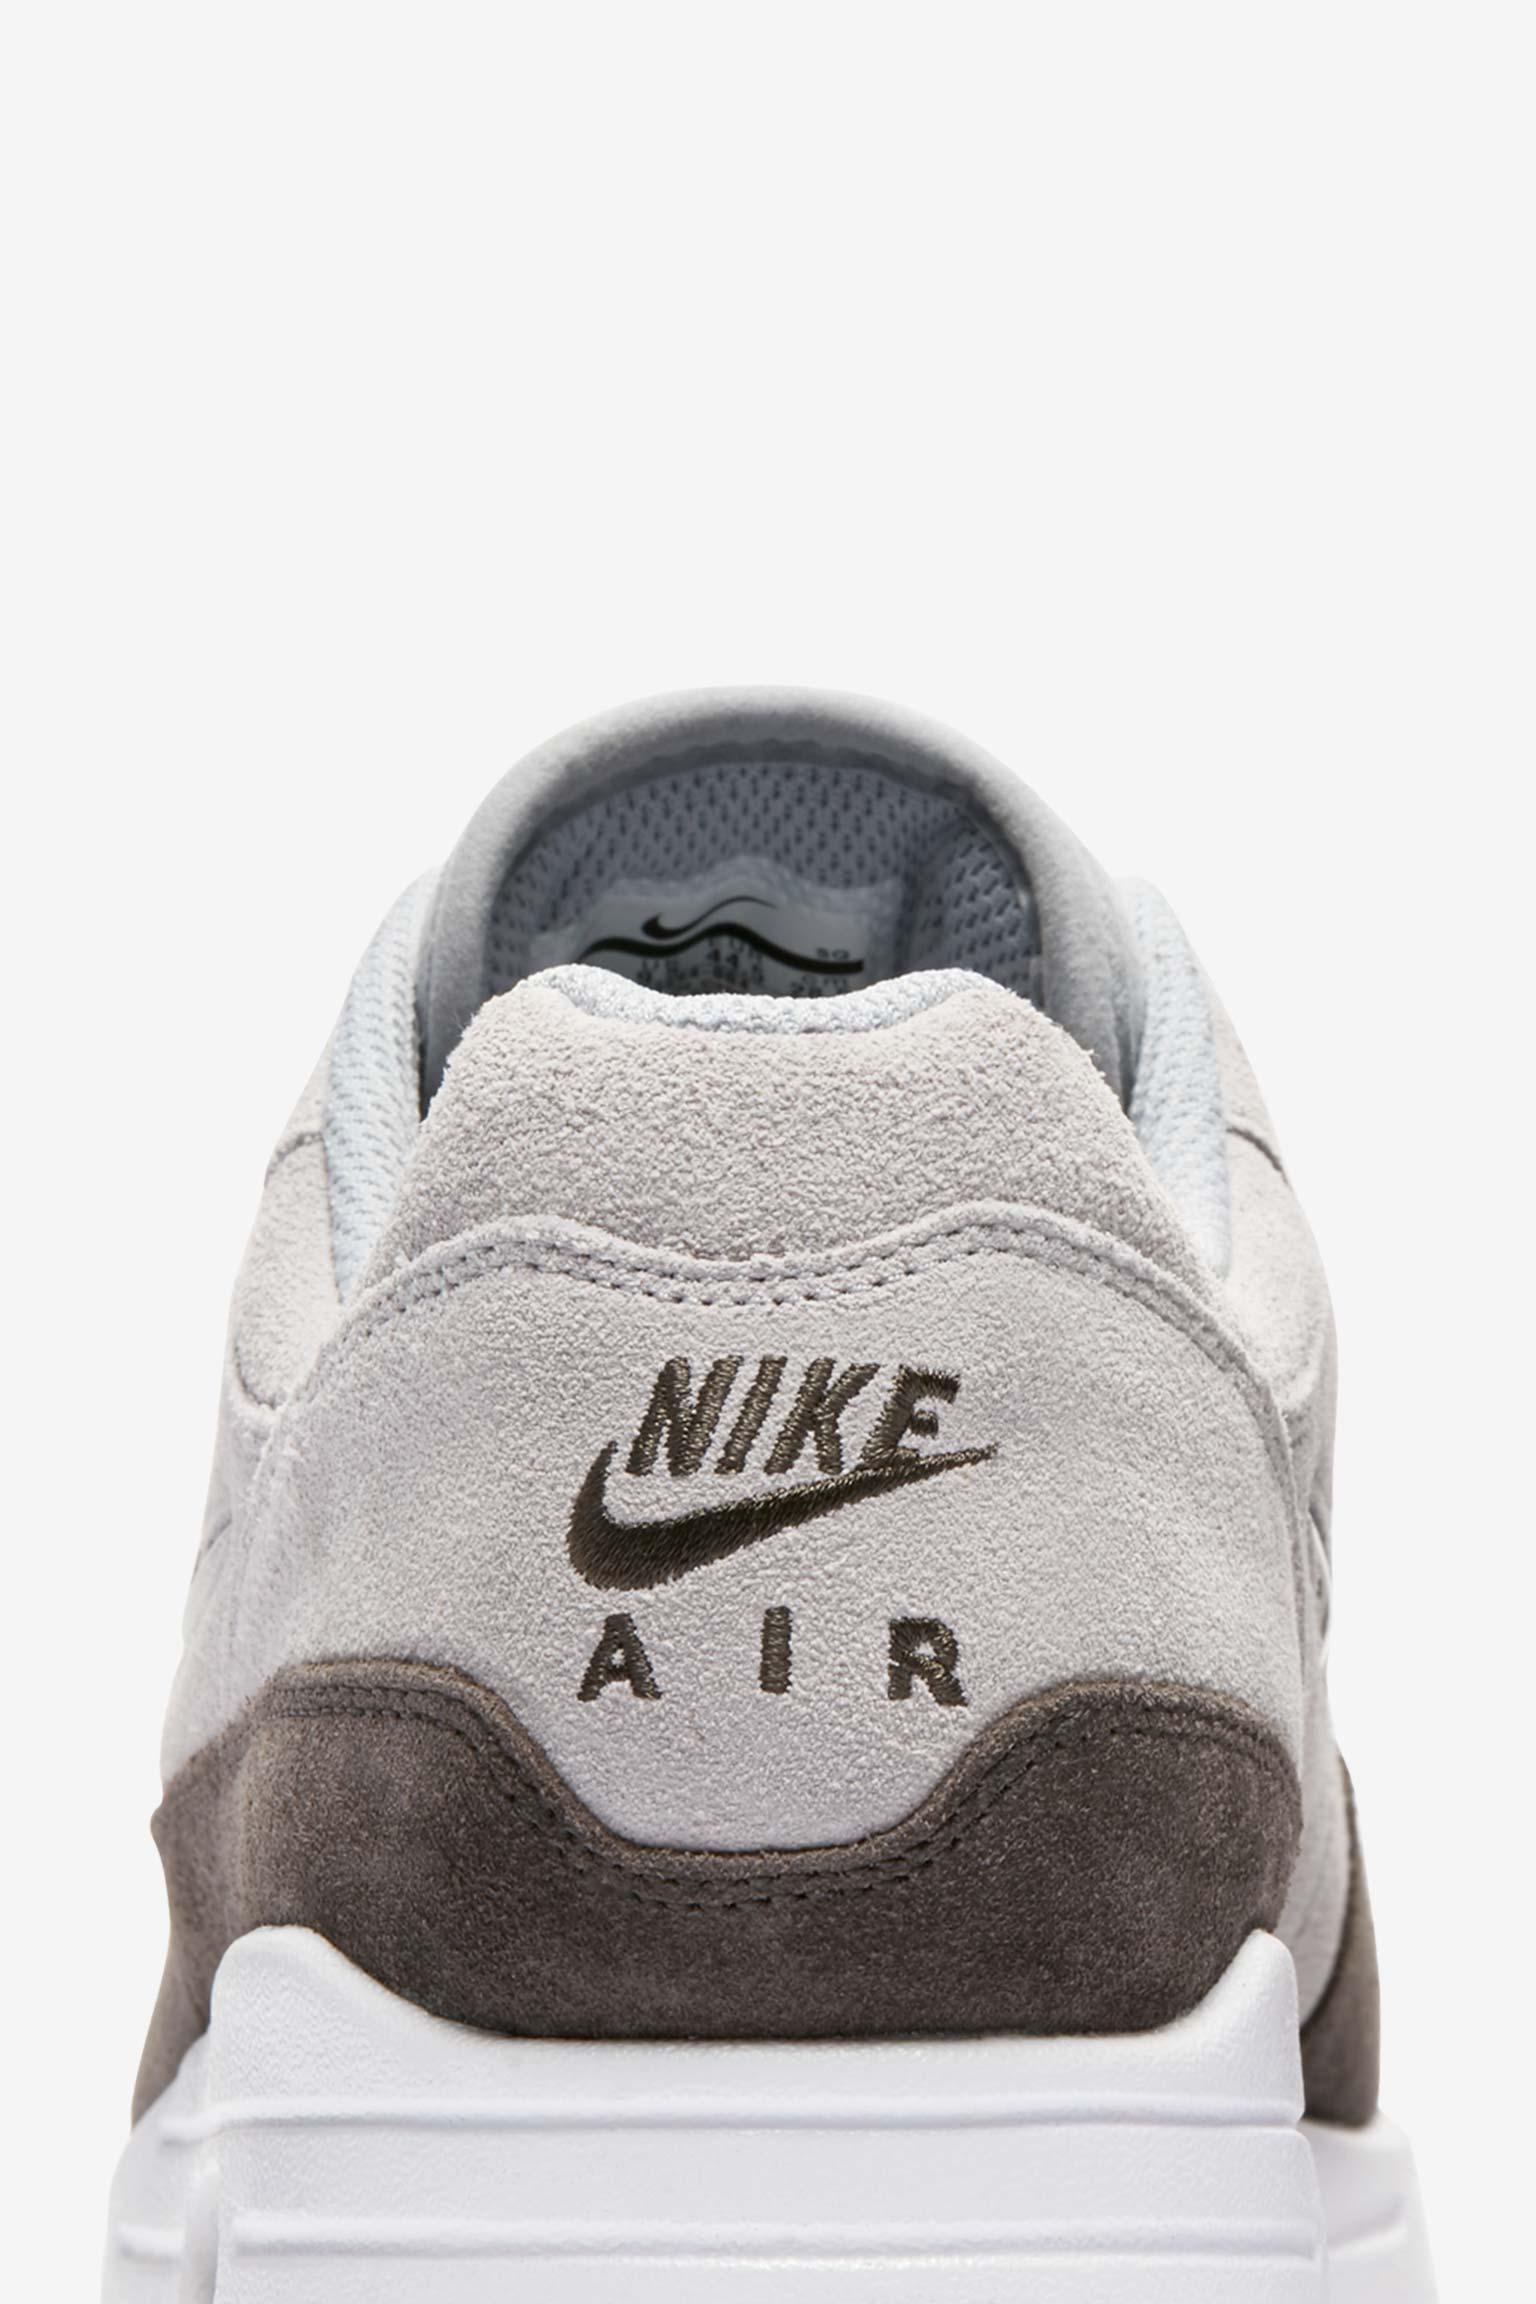 Nike Air Max 1 Premium « Wolf Grey ».. Nike SNKRS BE